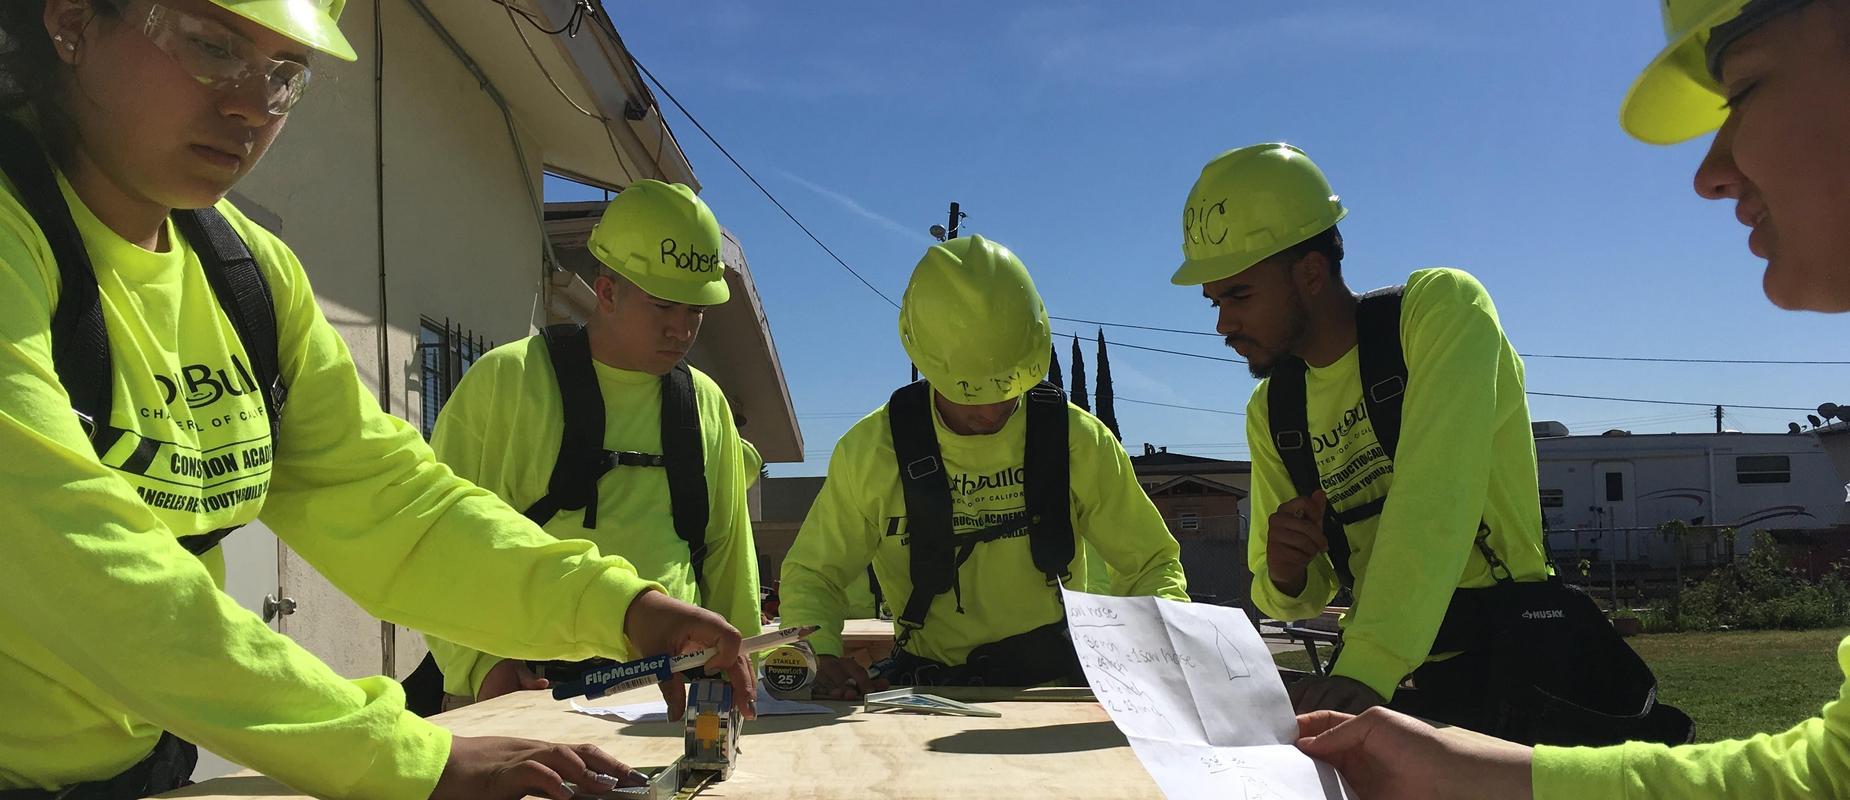 Construction students making measurements